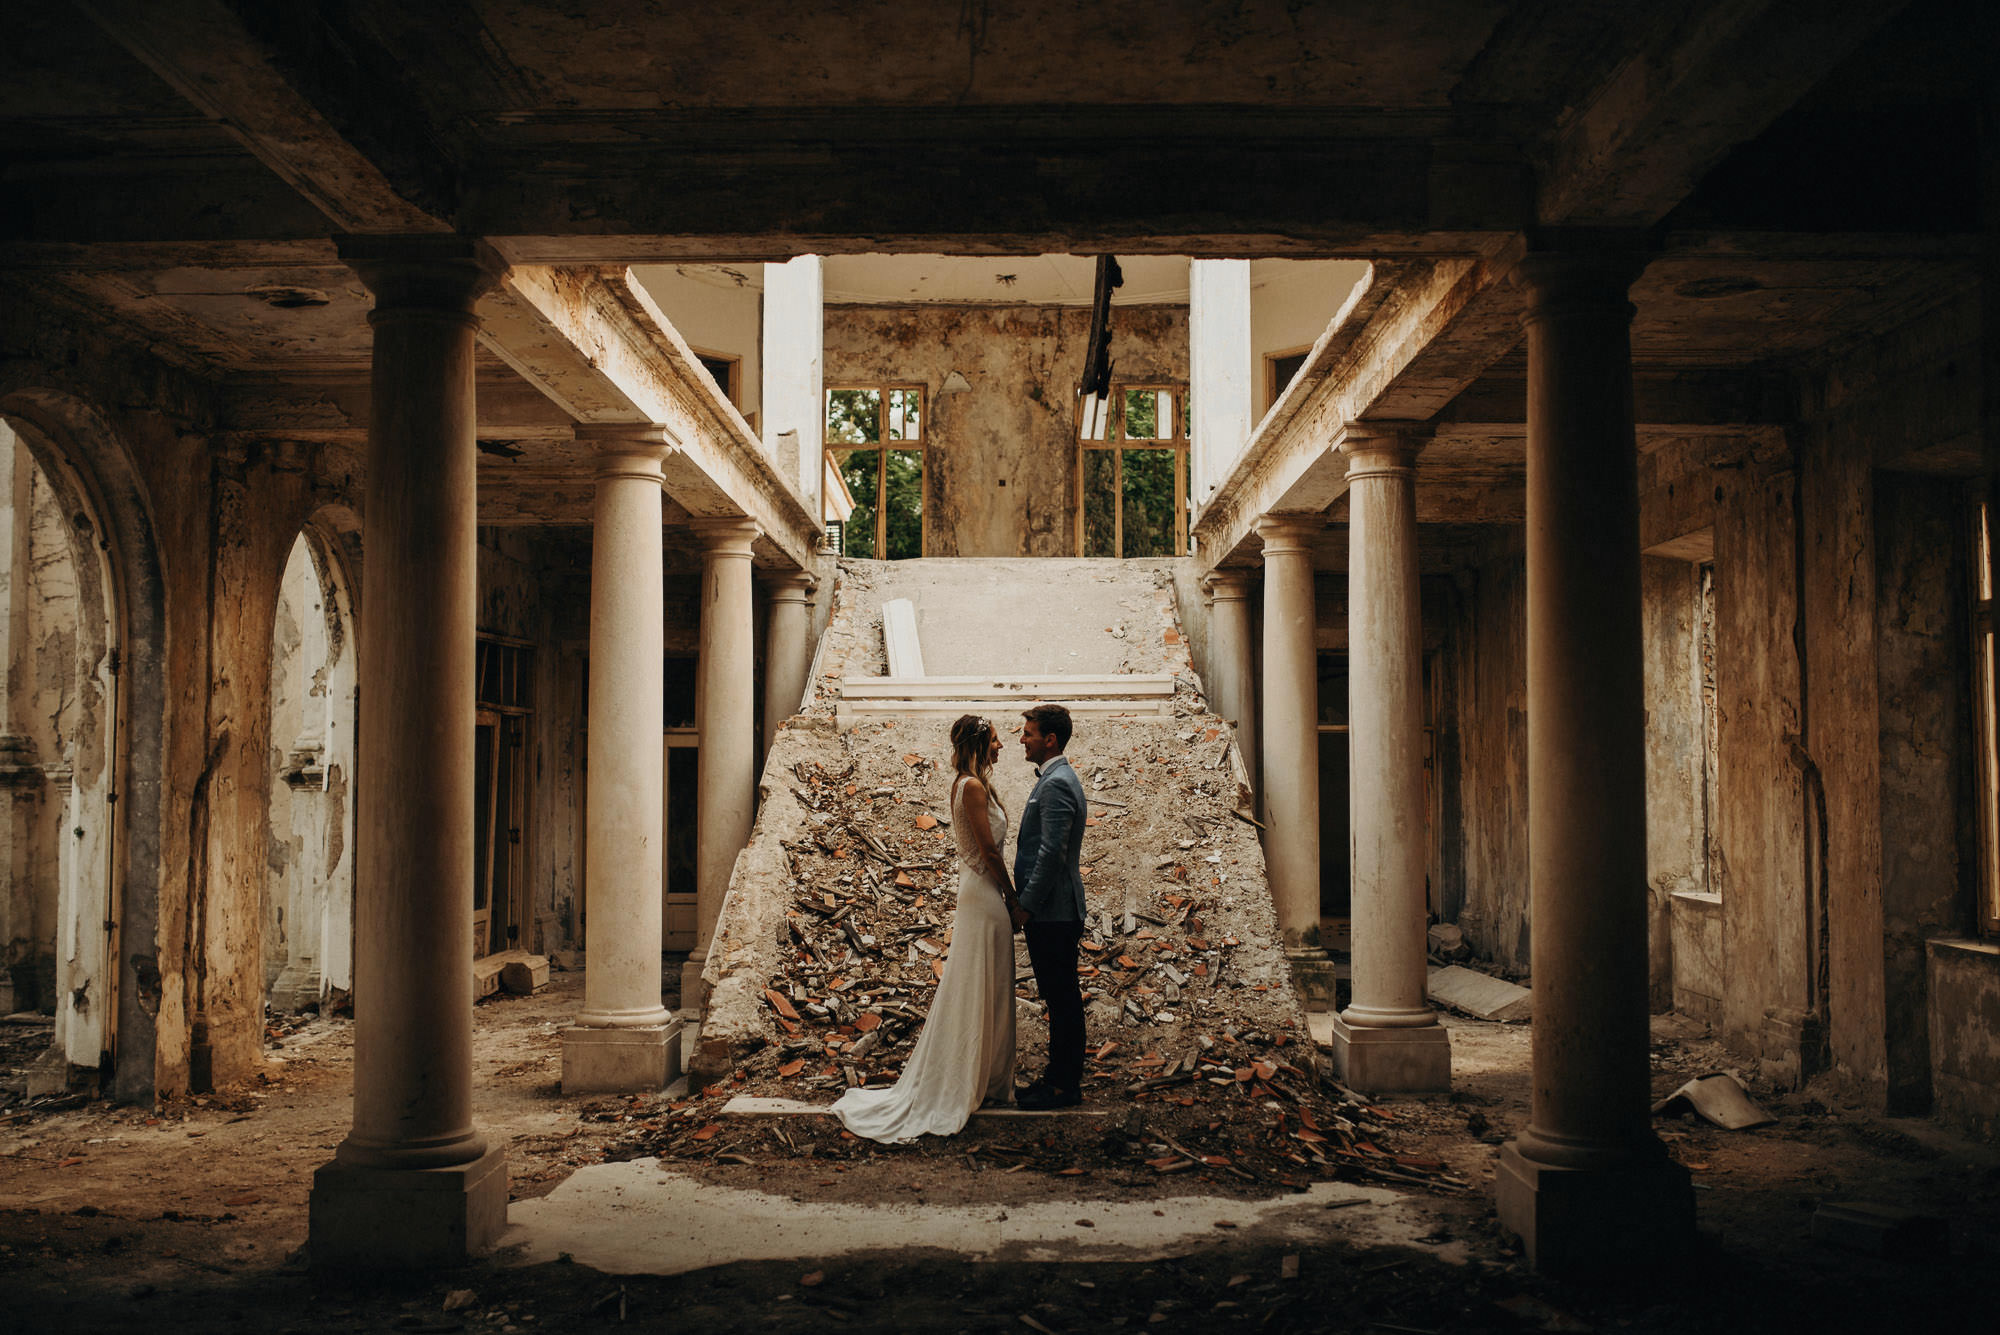 dubrovnik_croatia_wedding_photographer-jere_satamo-destination_weddings-110-web.jpg